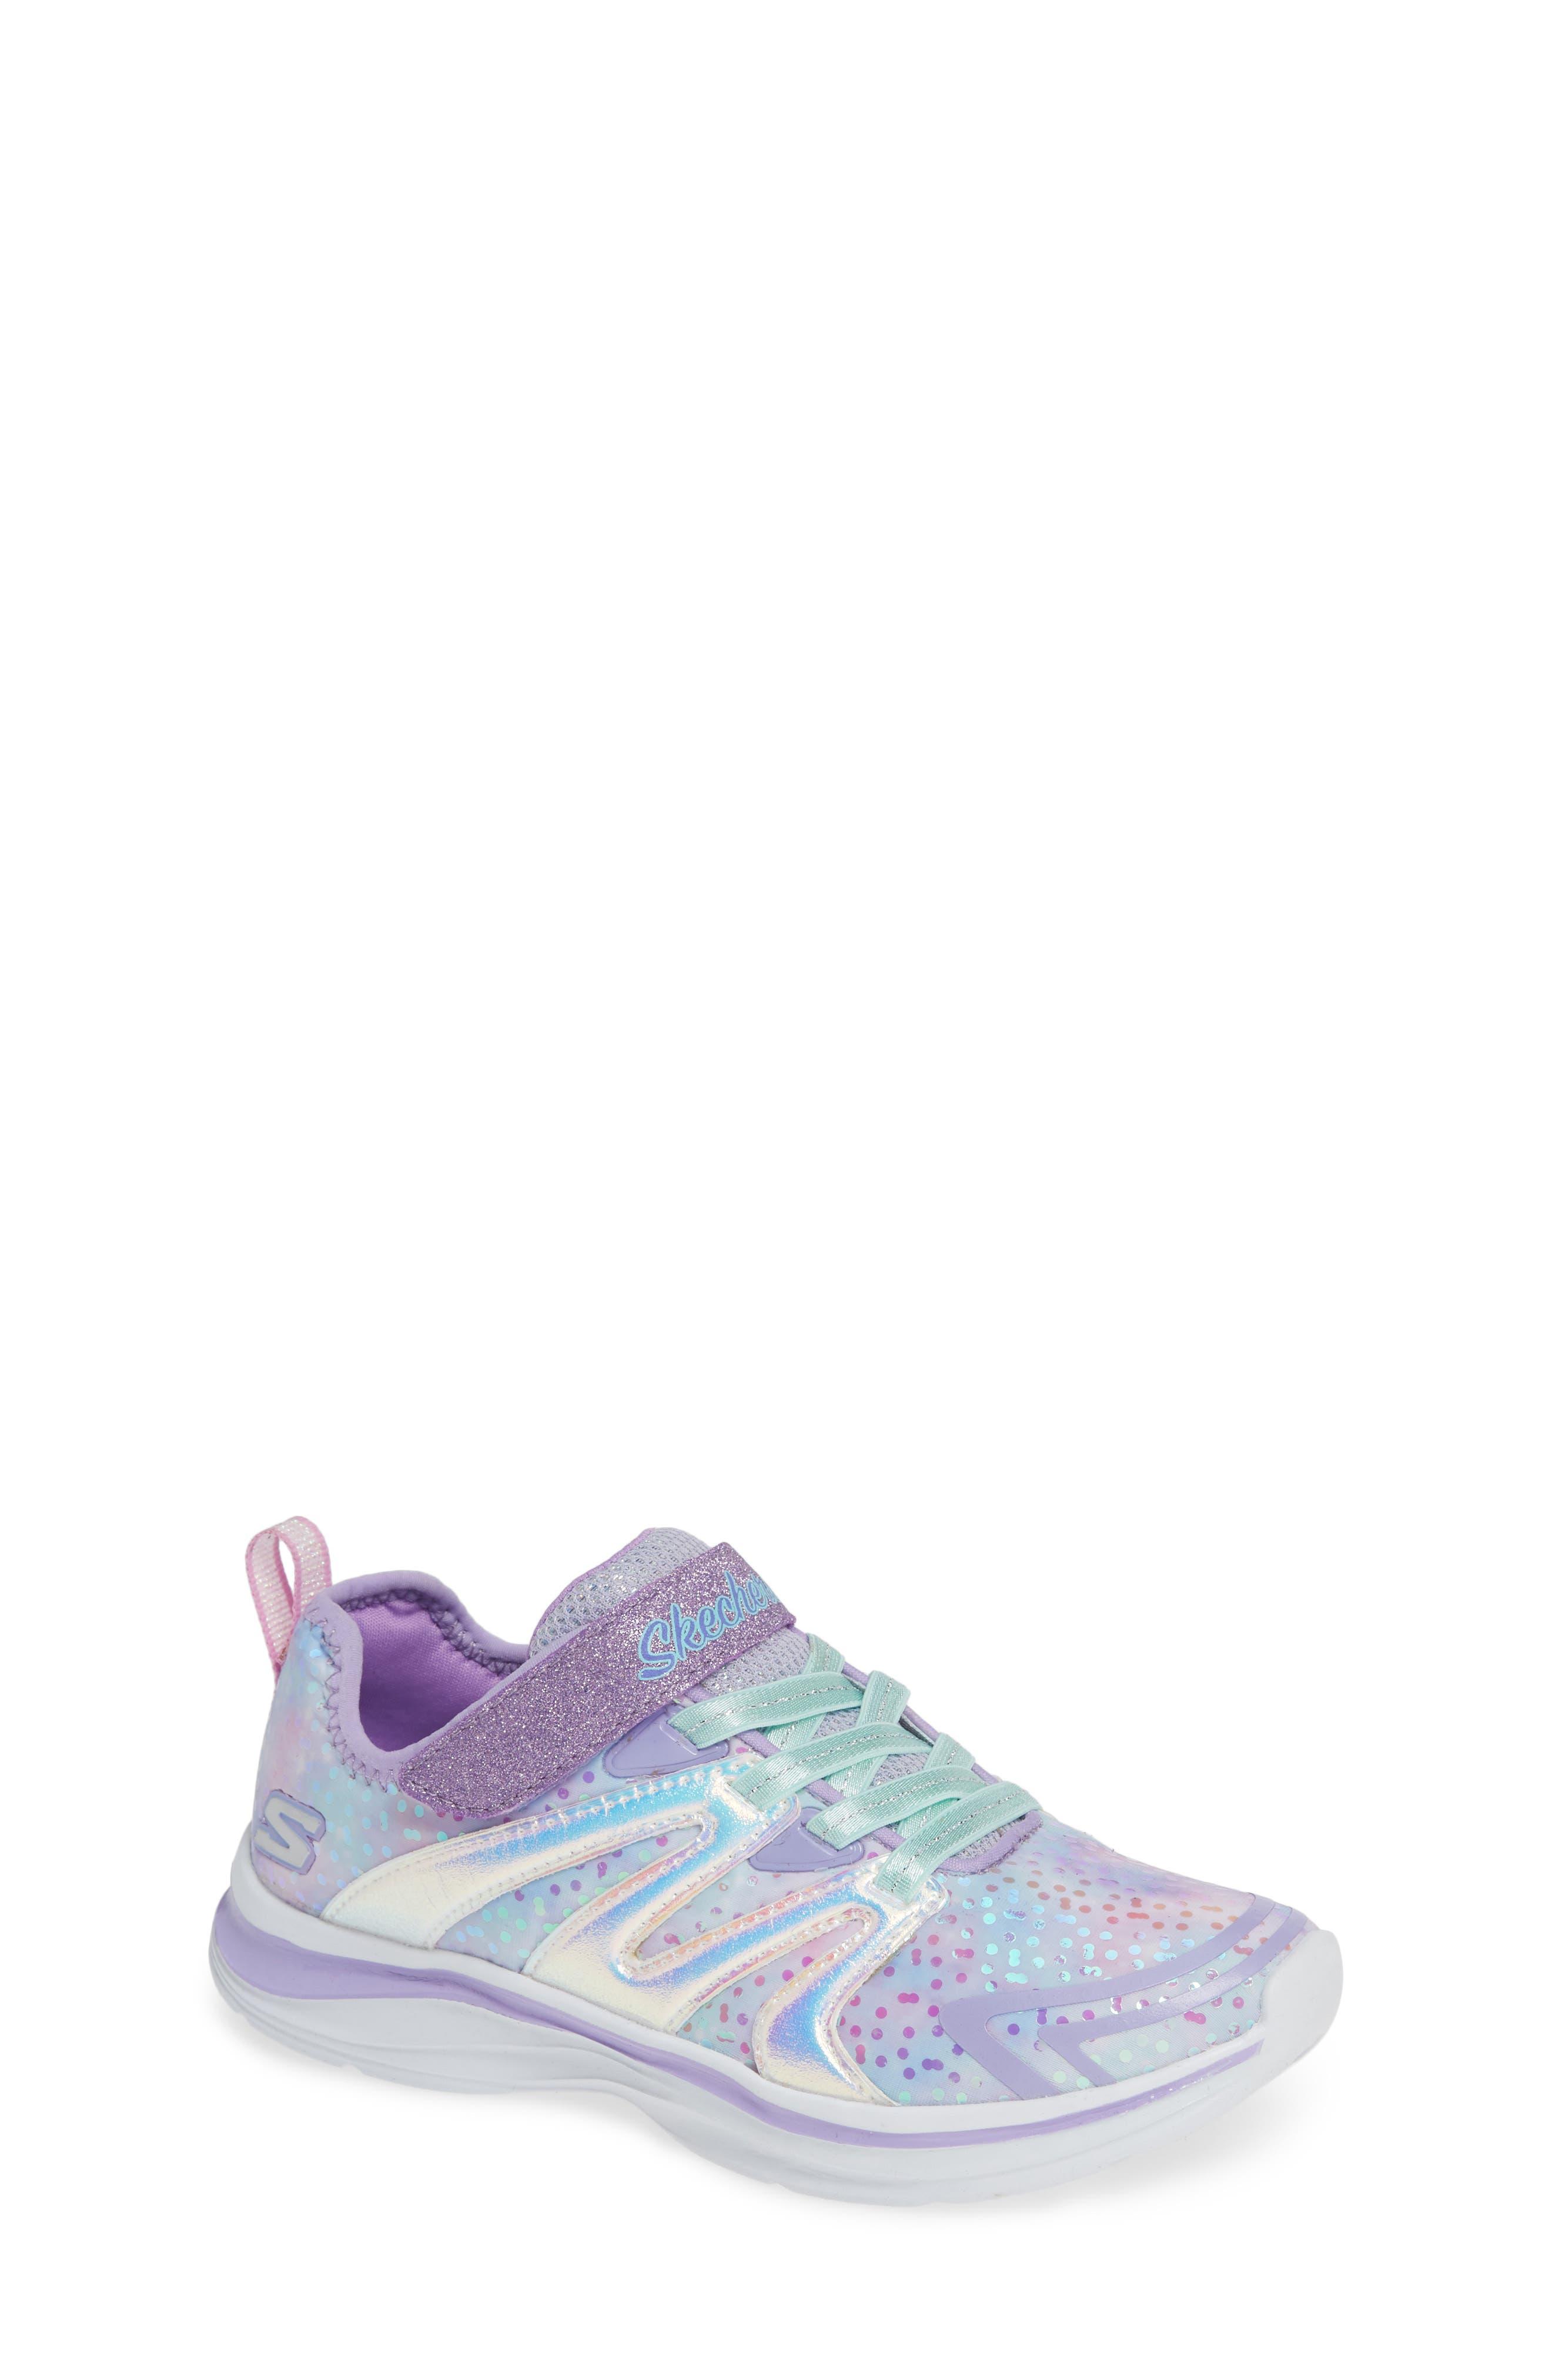 Double Dreams Shimmer Sneaker,                             Main thumbnail 1, color,                             LAVENDER/ MULTI